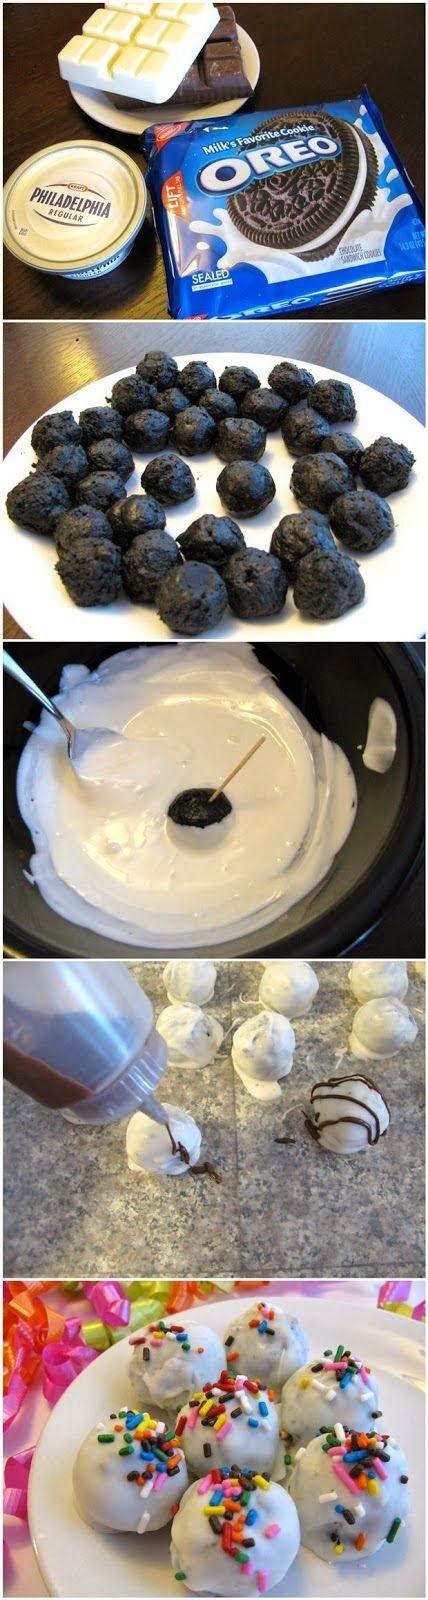 How To Oreo Balls Dessert Recipes Dessert Lover Food